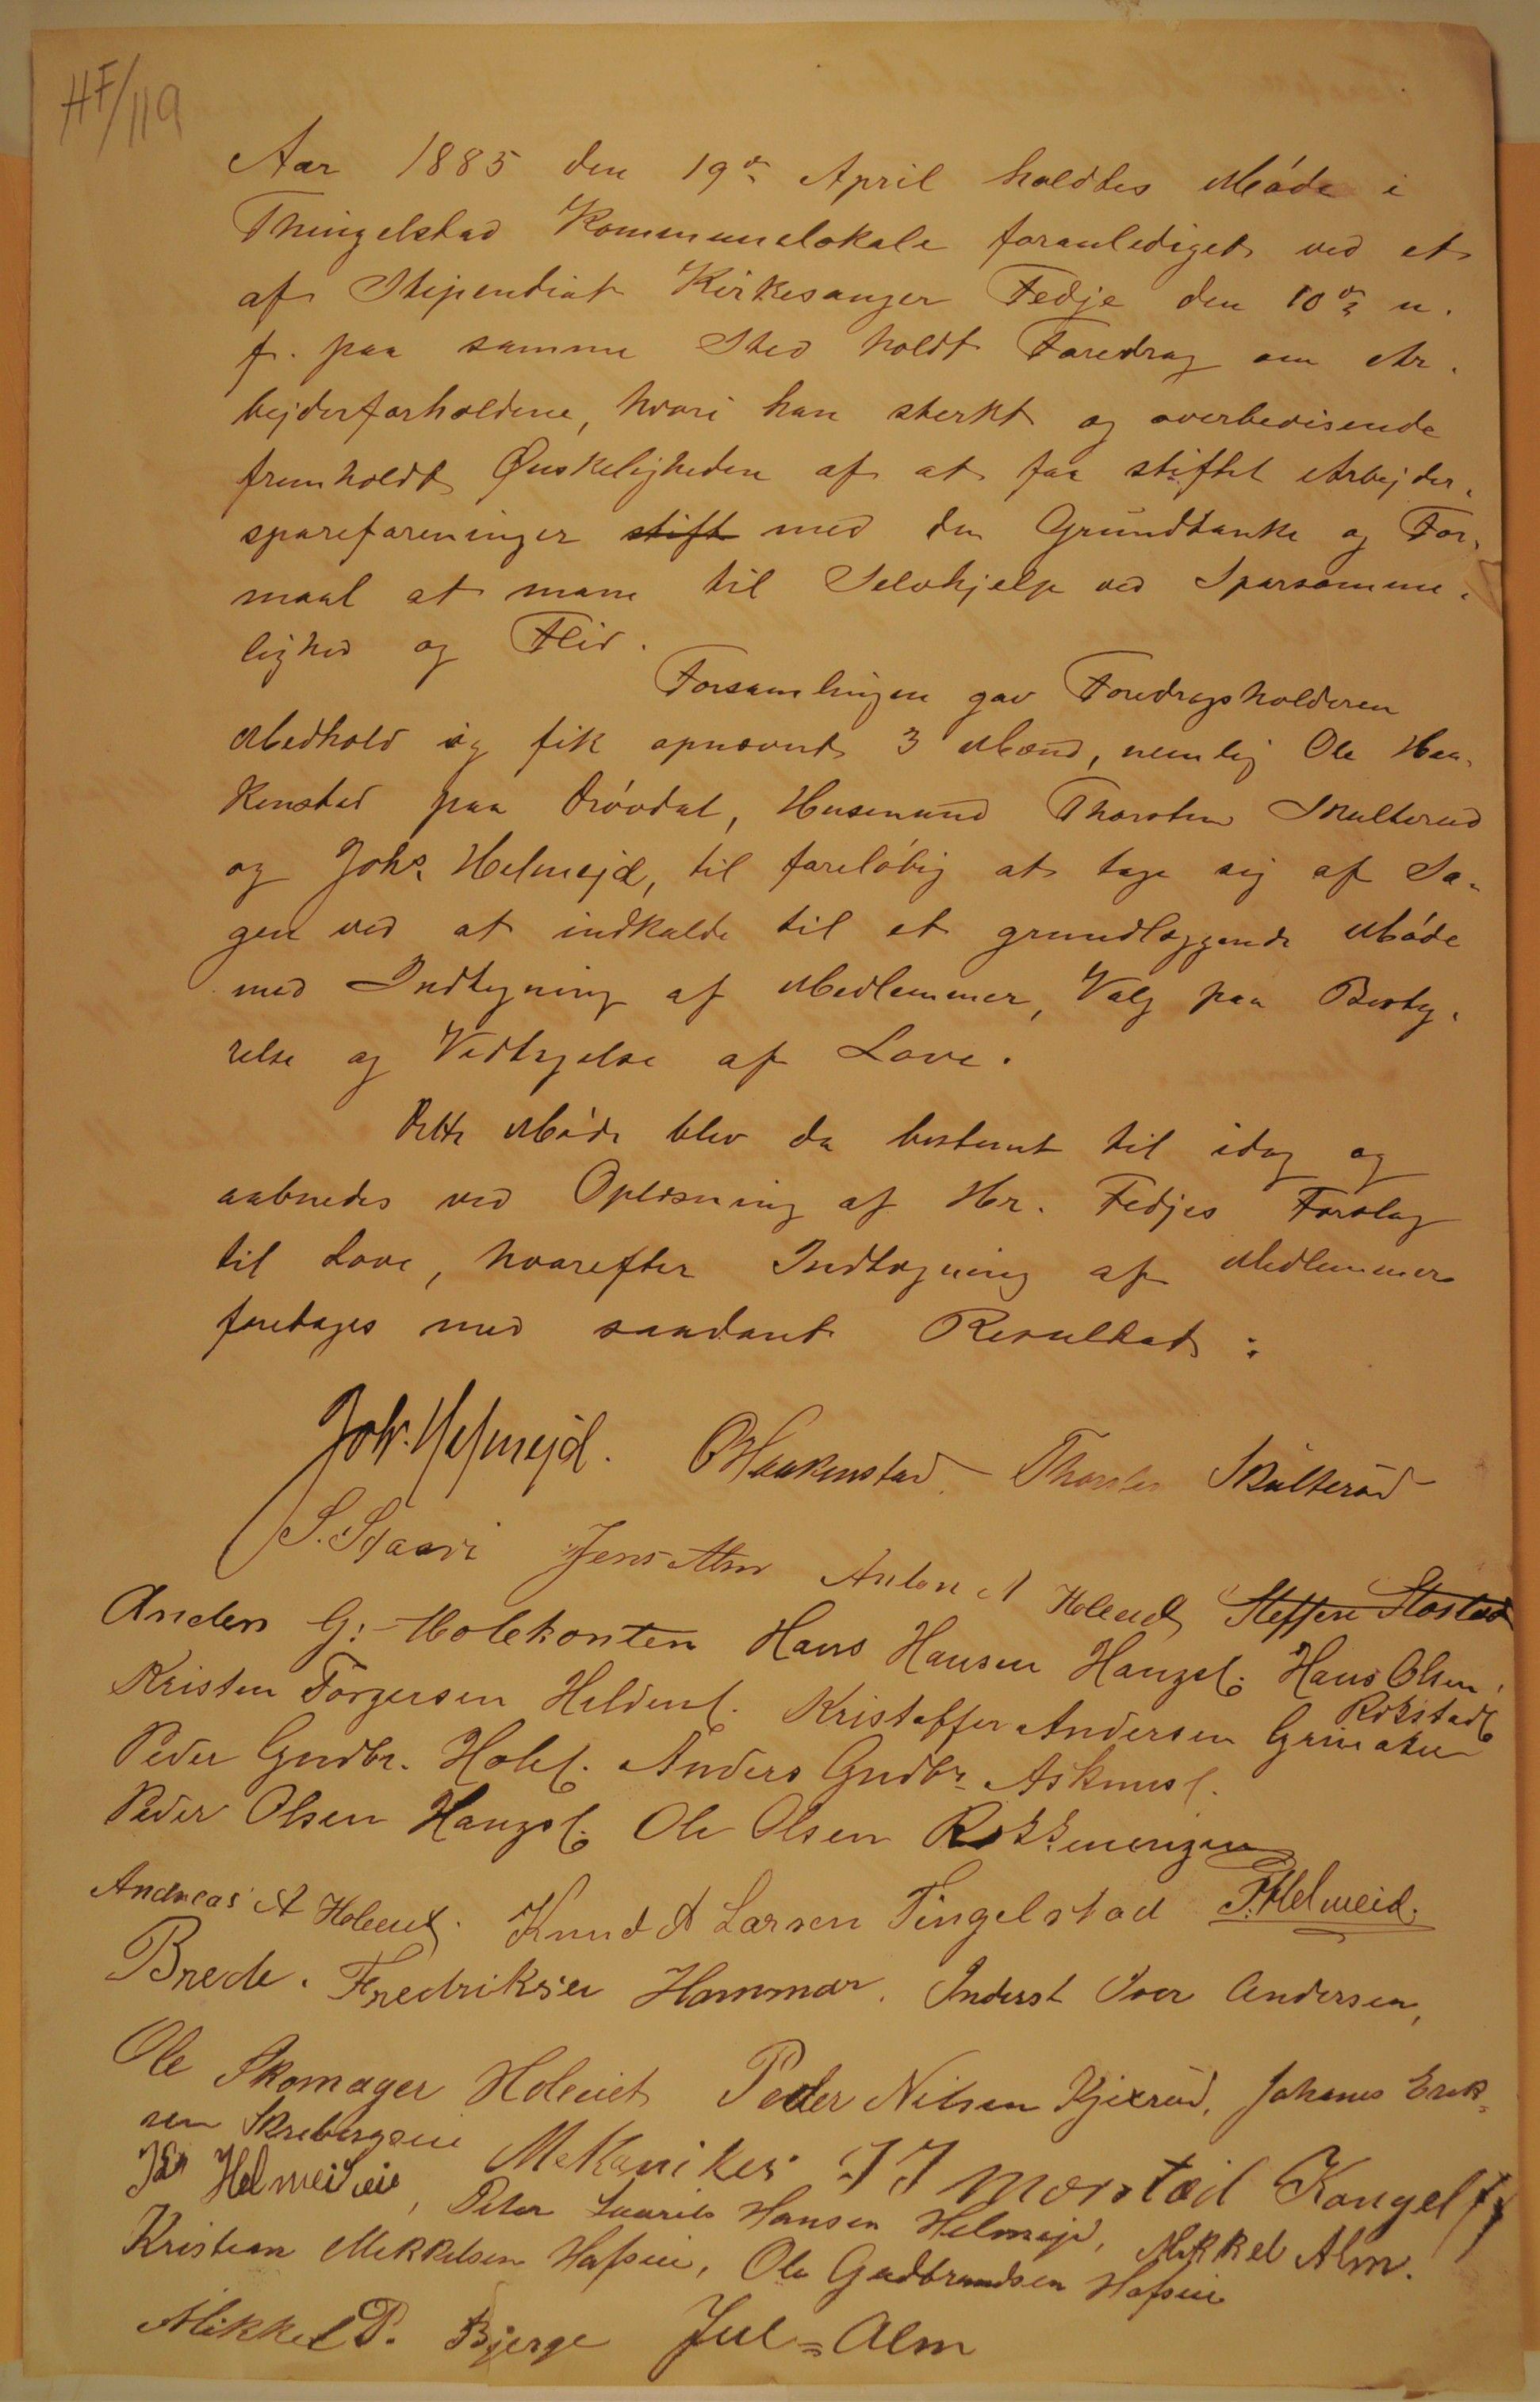 OARM, Thingelstad Arbeiderspareforening, stiftelsesdokument 1885, 1885